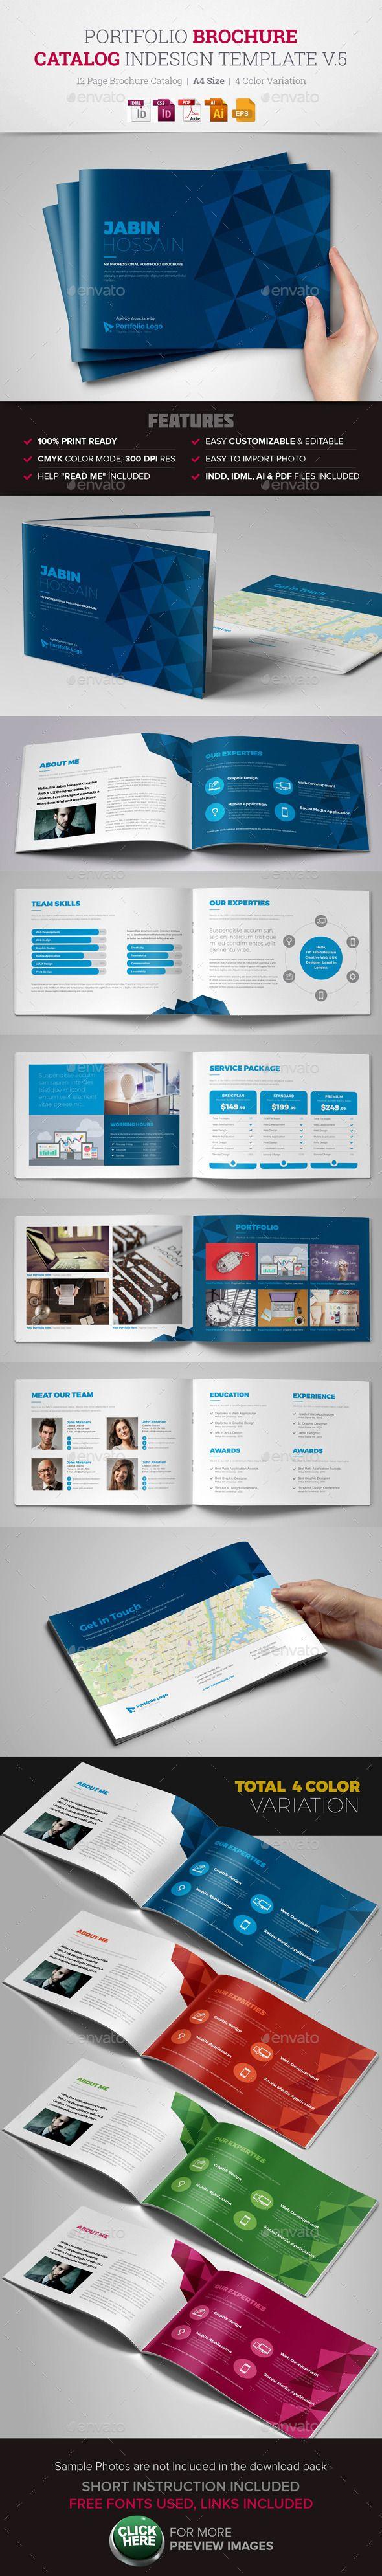 Portfolio Brochure InDesign Template v5 | Catálogo, Diseño editorial ...